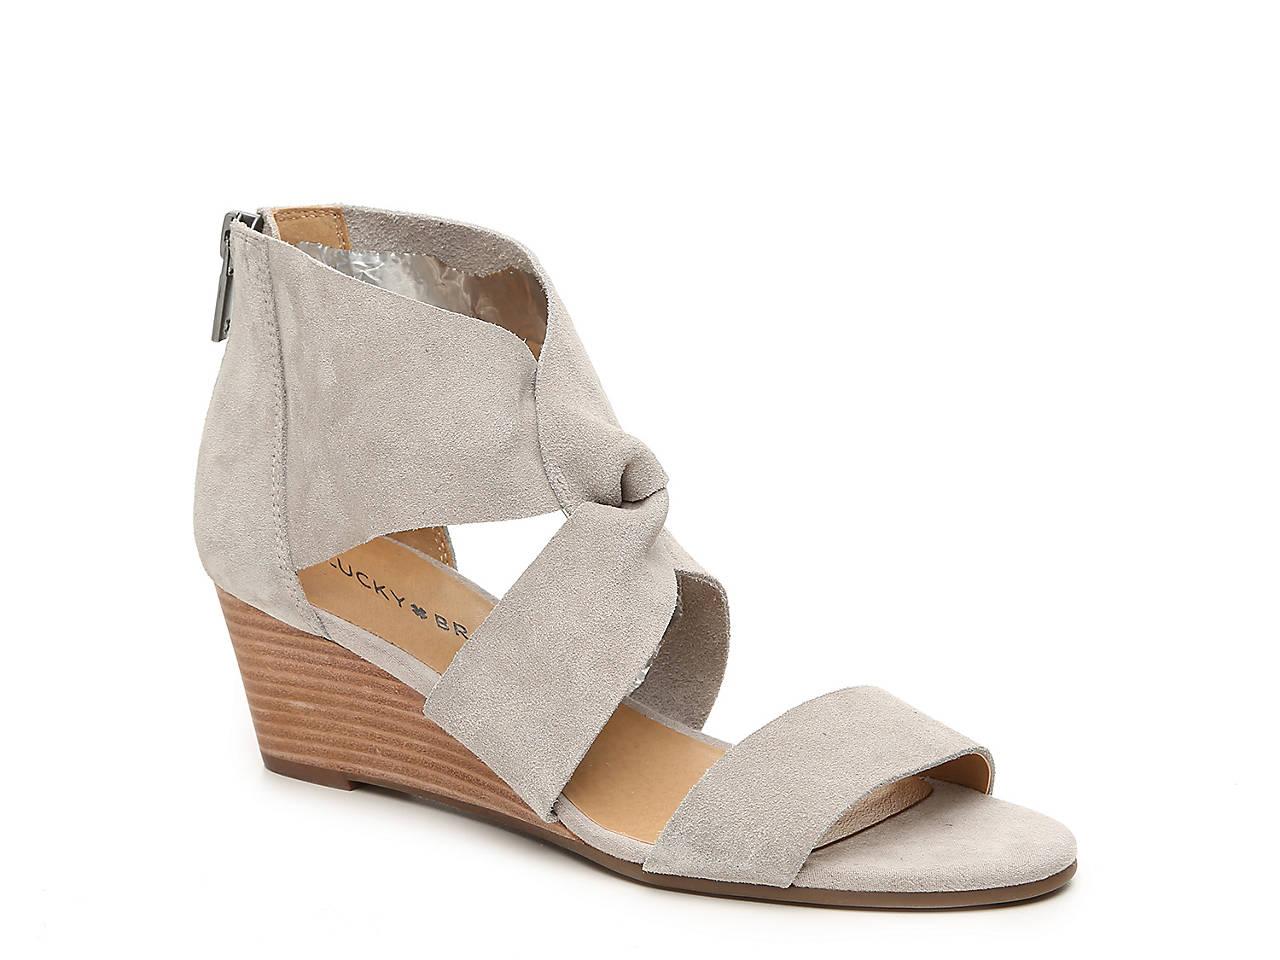 18c99f94526 Lucky Brand Jamain Wedge Sandal Women s Shoes